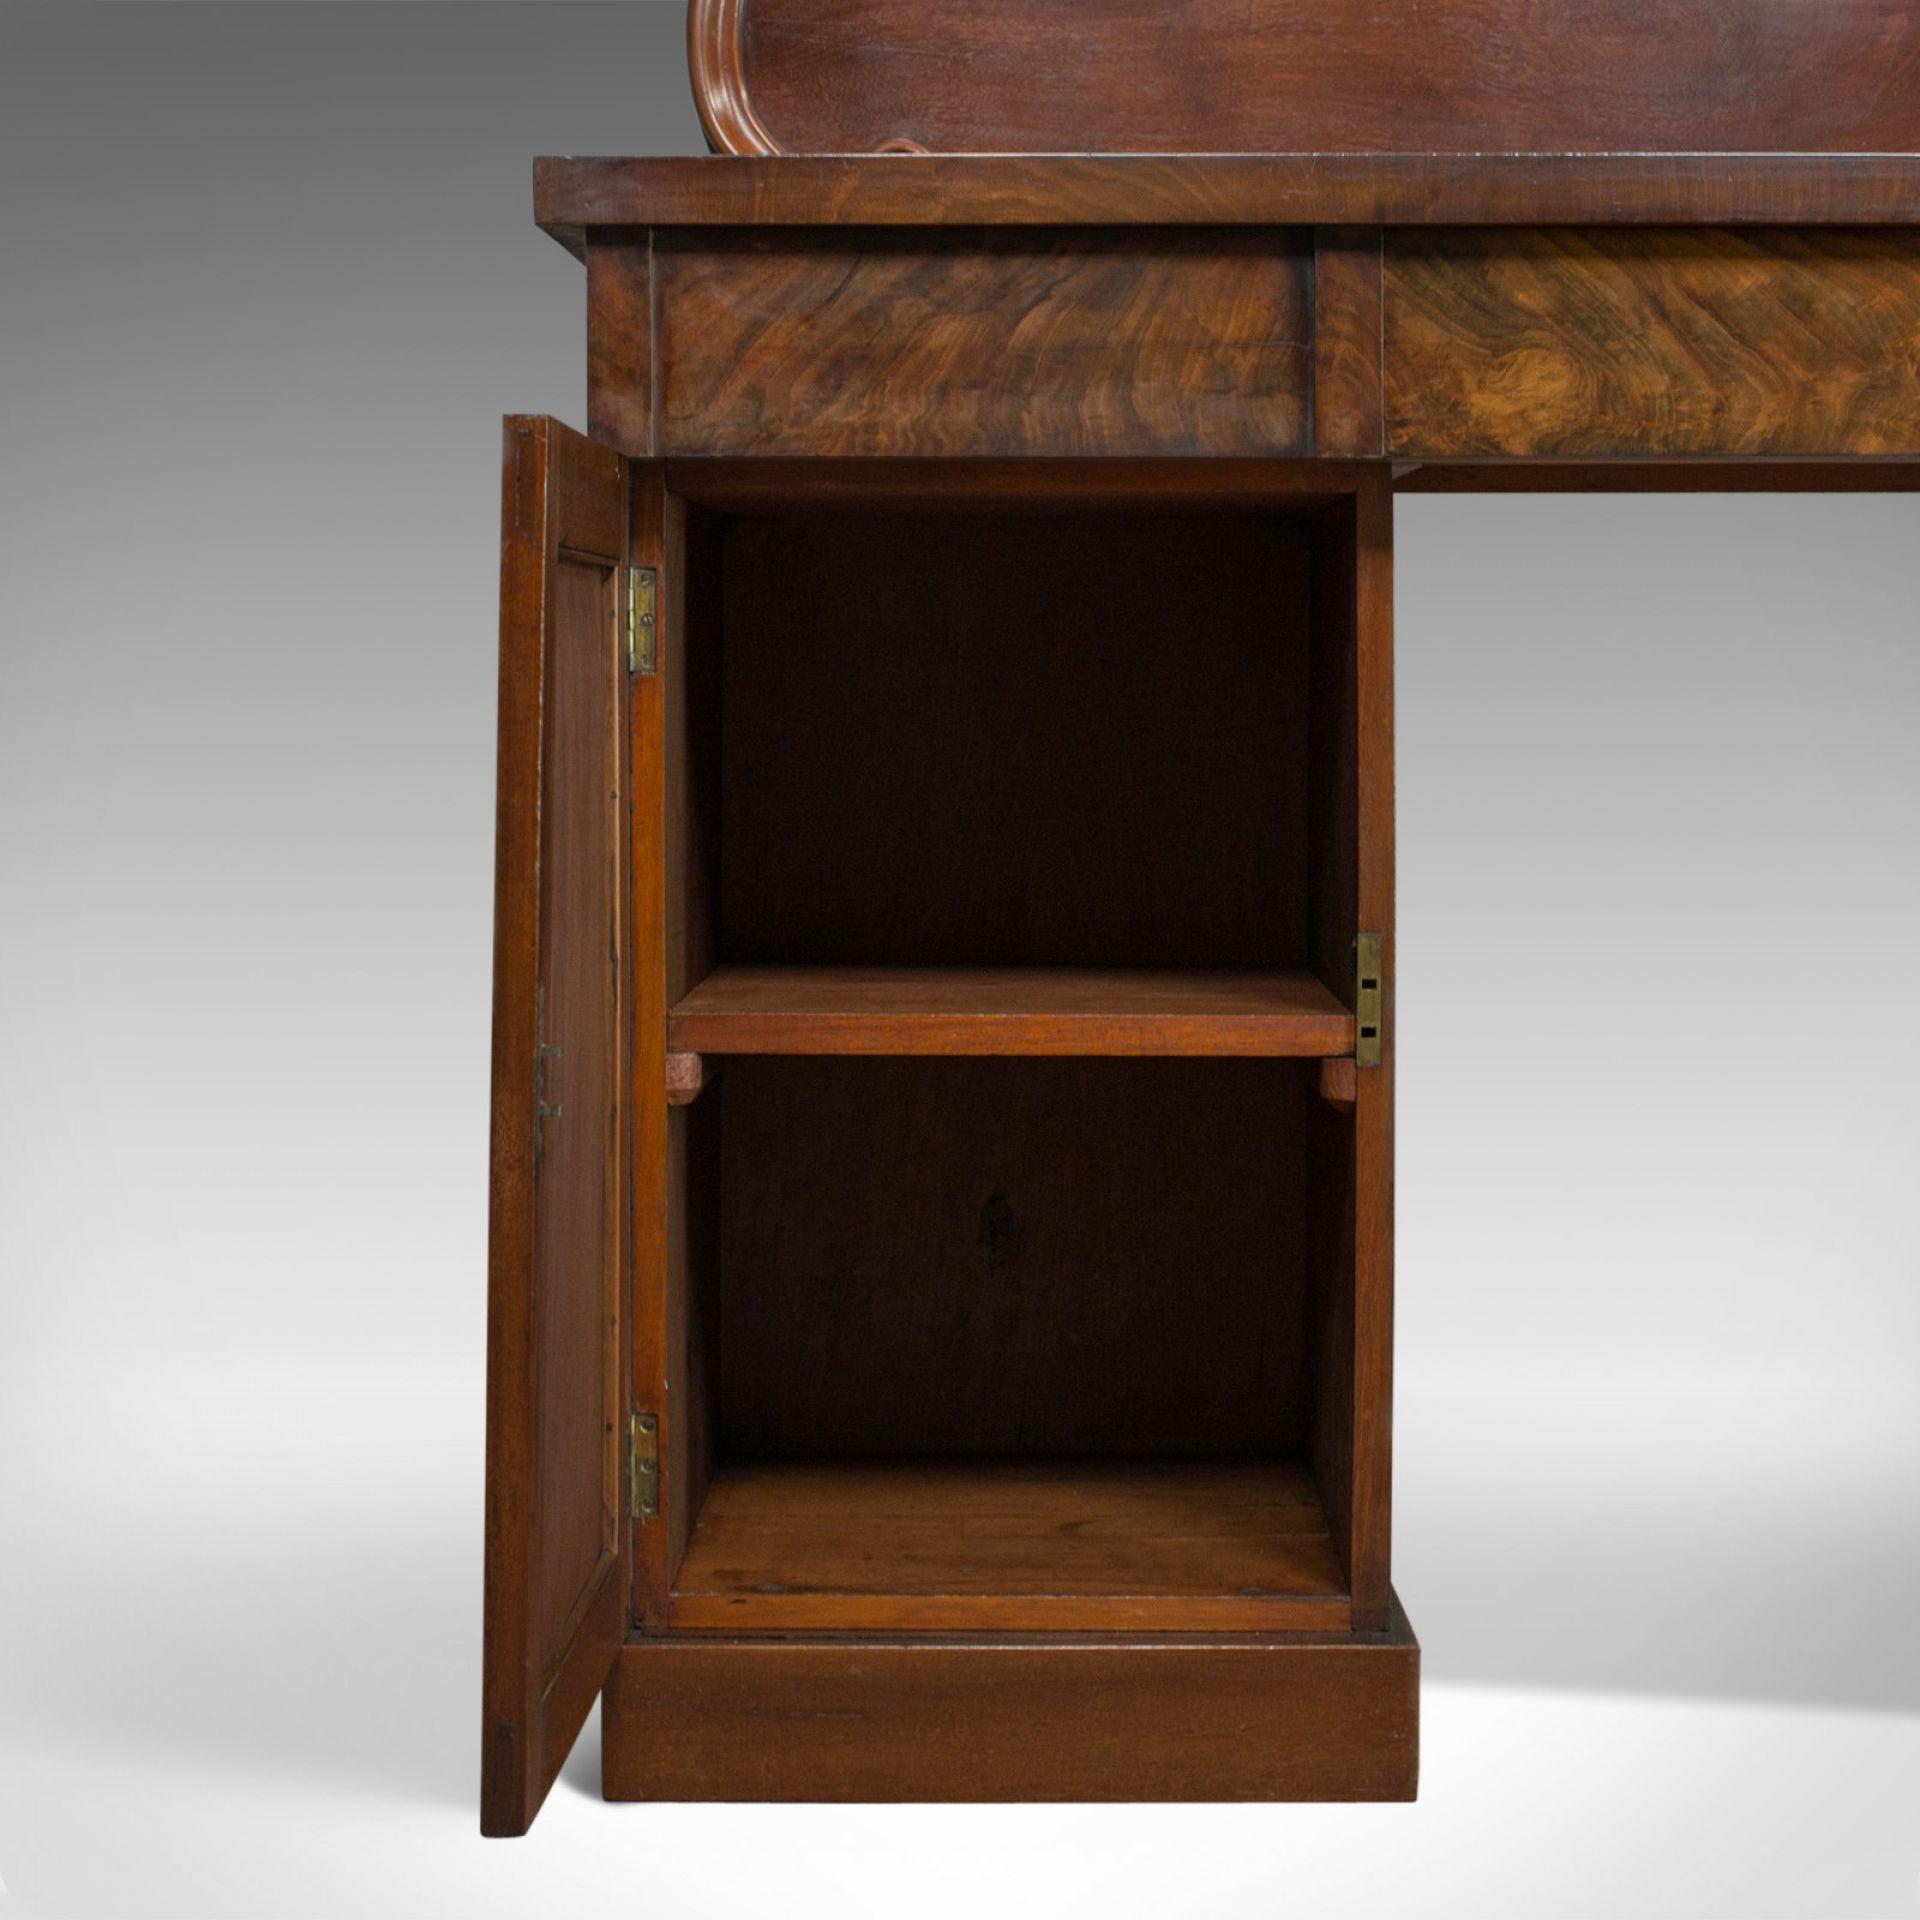 Antique Pedestal Sideboard, English, Mahogany, Dresser, Victorian, Circa 1850